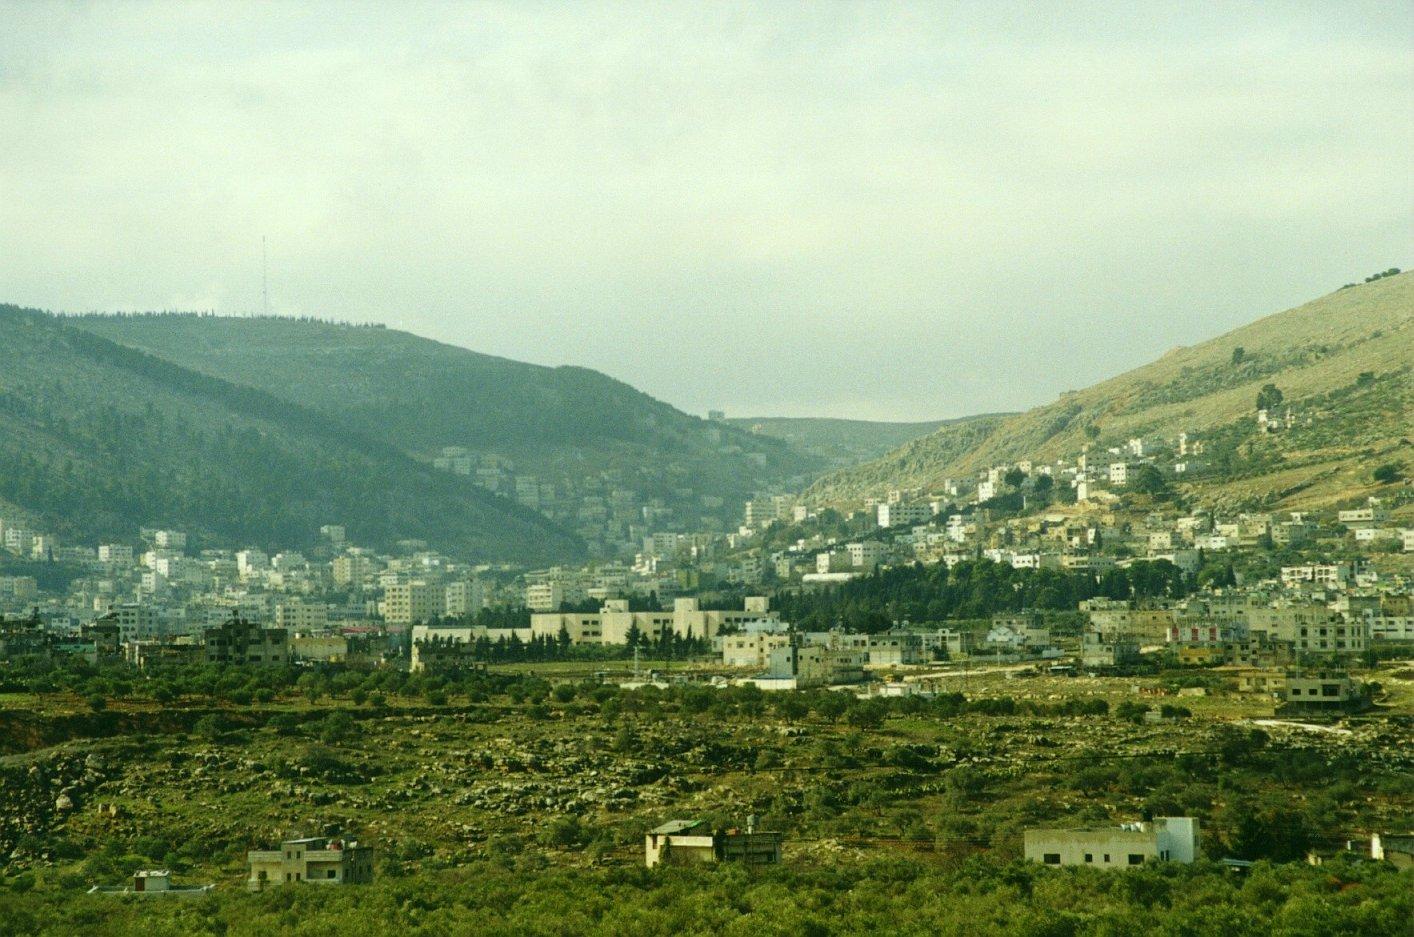 Palestine-Nablus picture, Palestine-Nablus photo, Palestine-Nablus ...